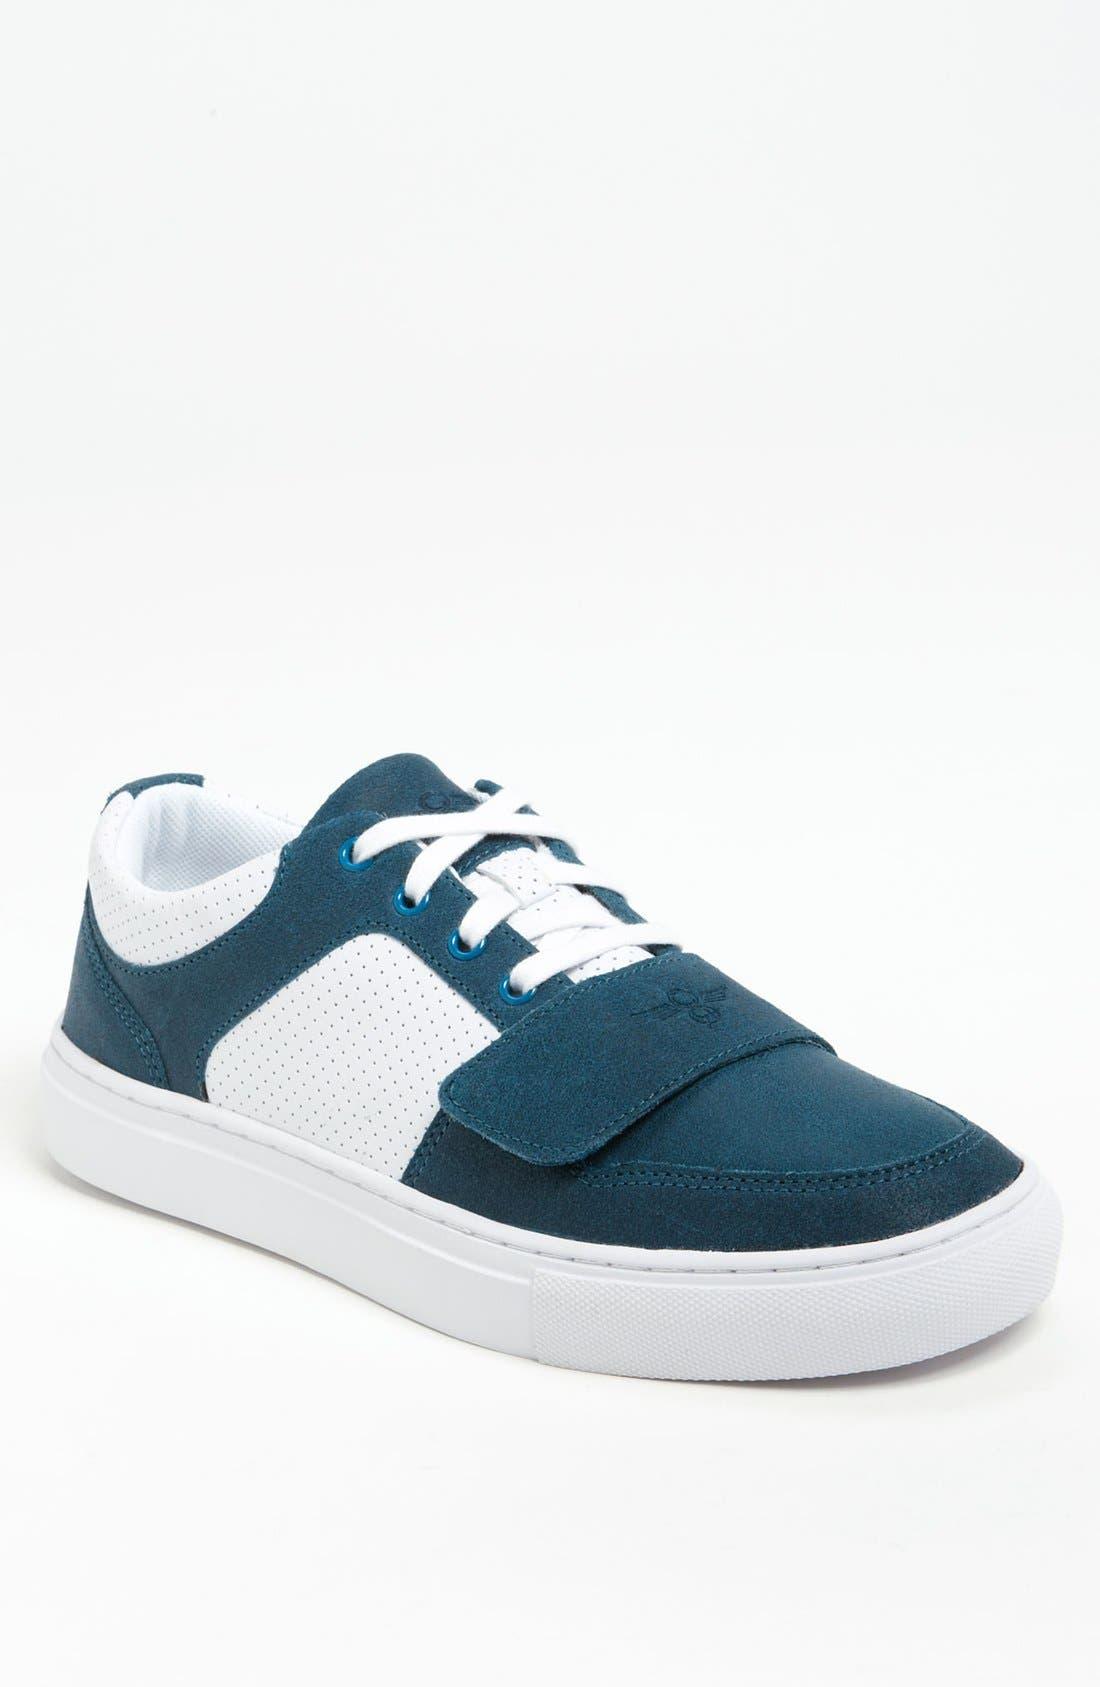 Alternate Image 1 Selected - Creative Recreation 'Cesario Lo X' Sneaker (Men)